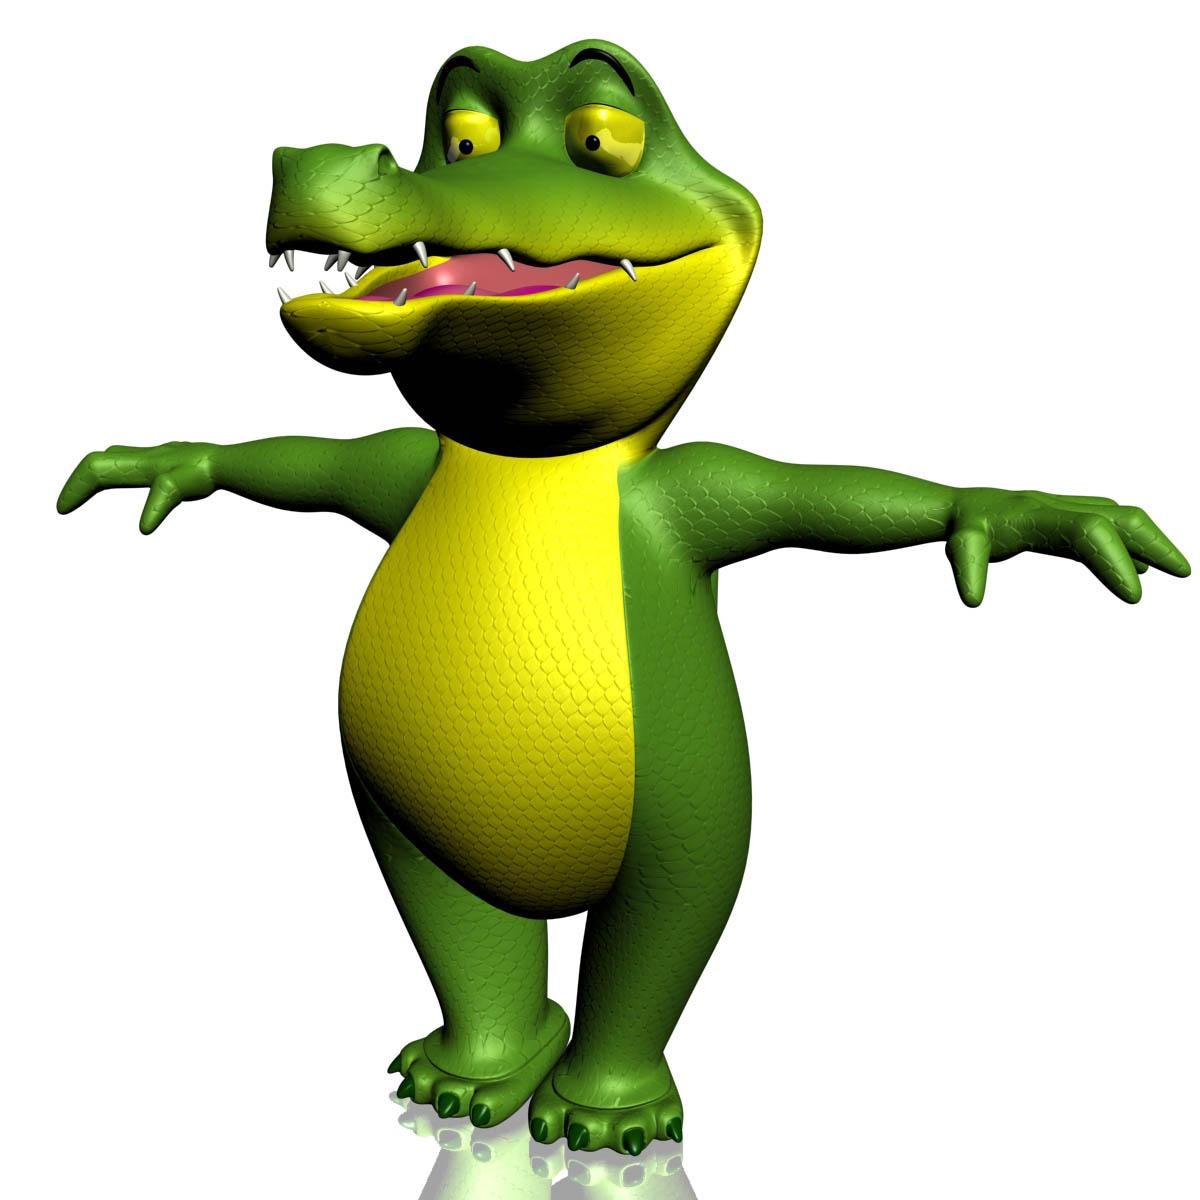 Cartoon Crocodile RIGGED 3D Model – Buy Cartoon Crocodile ... - photo#26